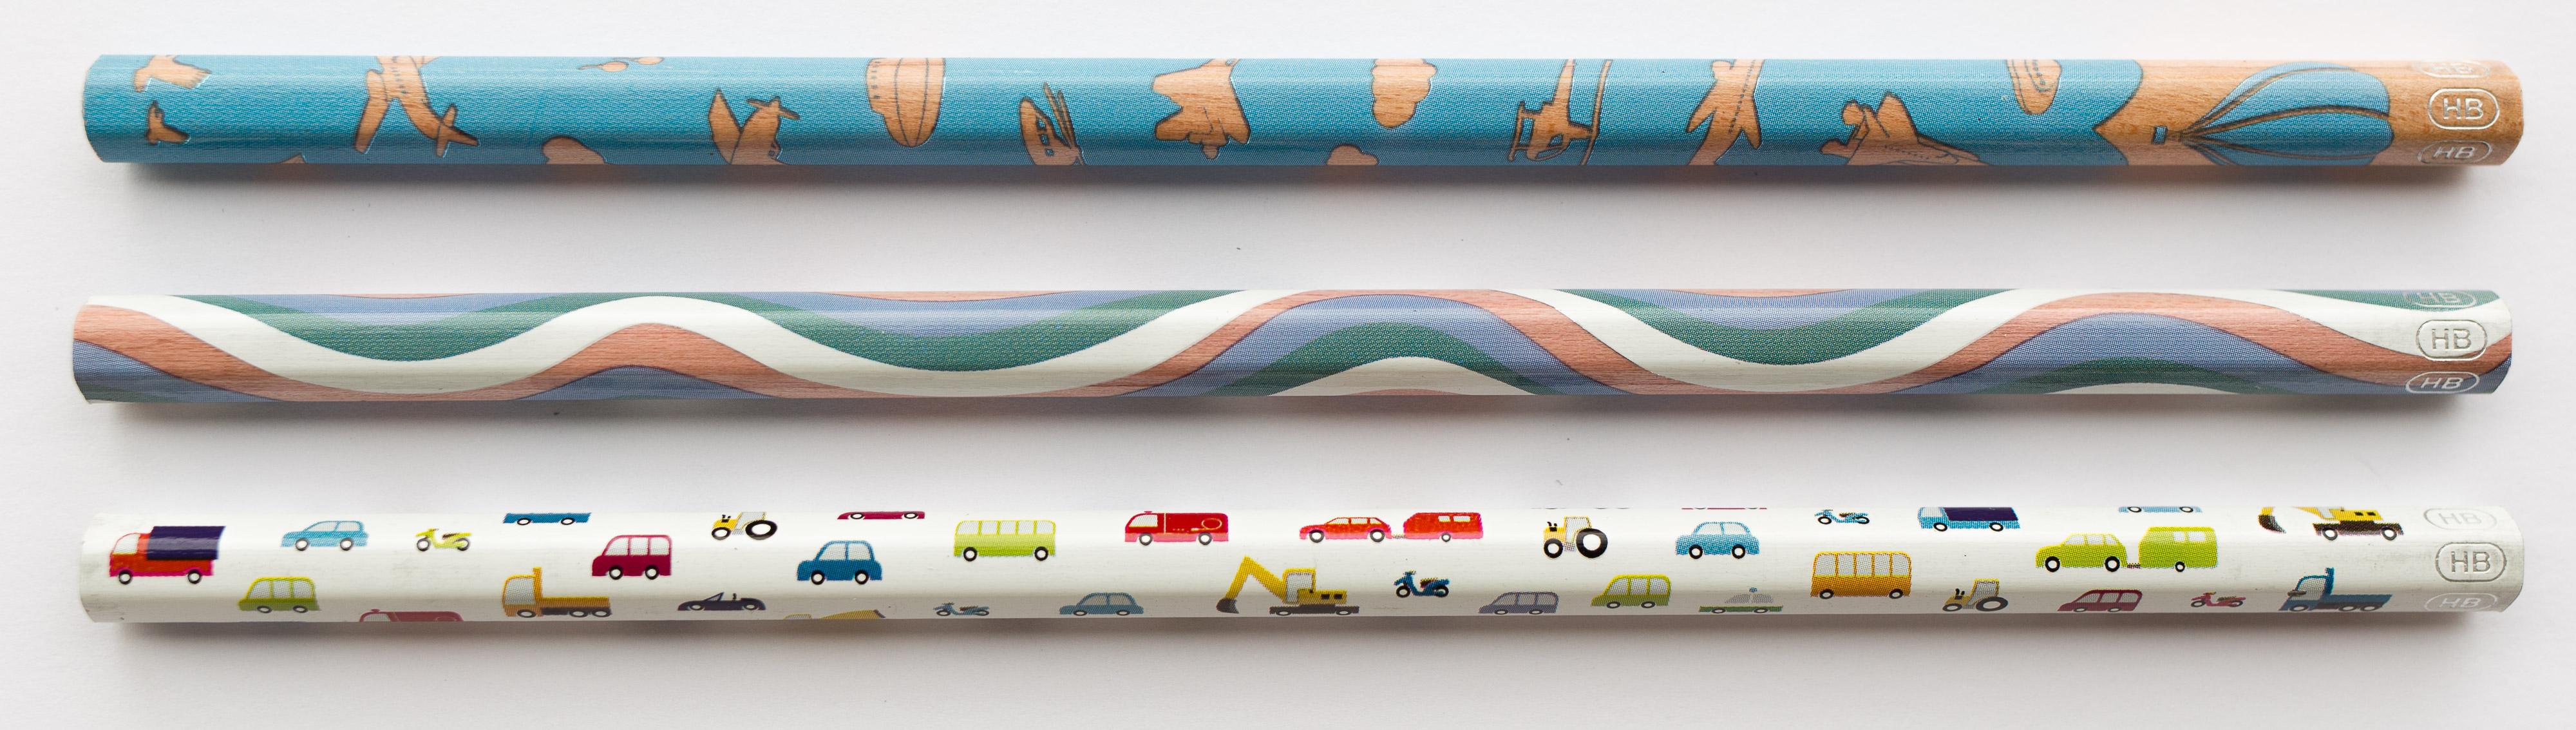 staedtler u0026 39 s kakikata pencils